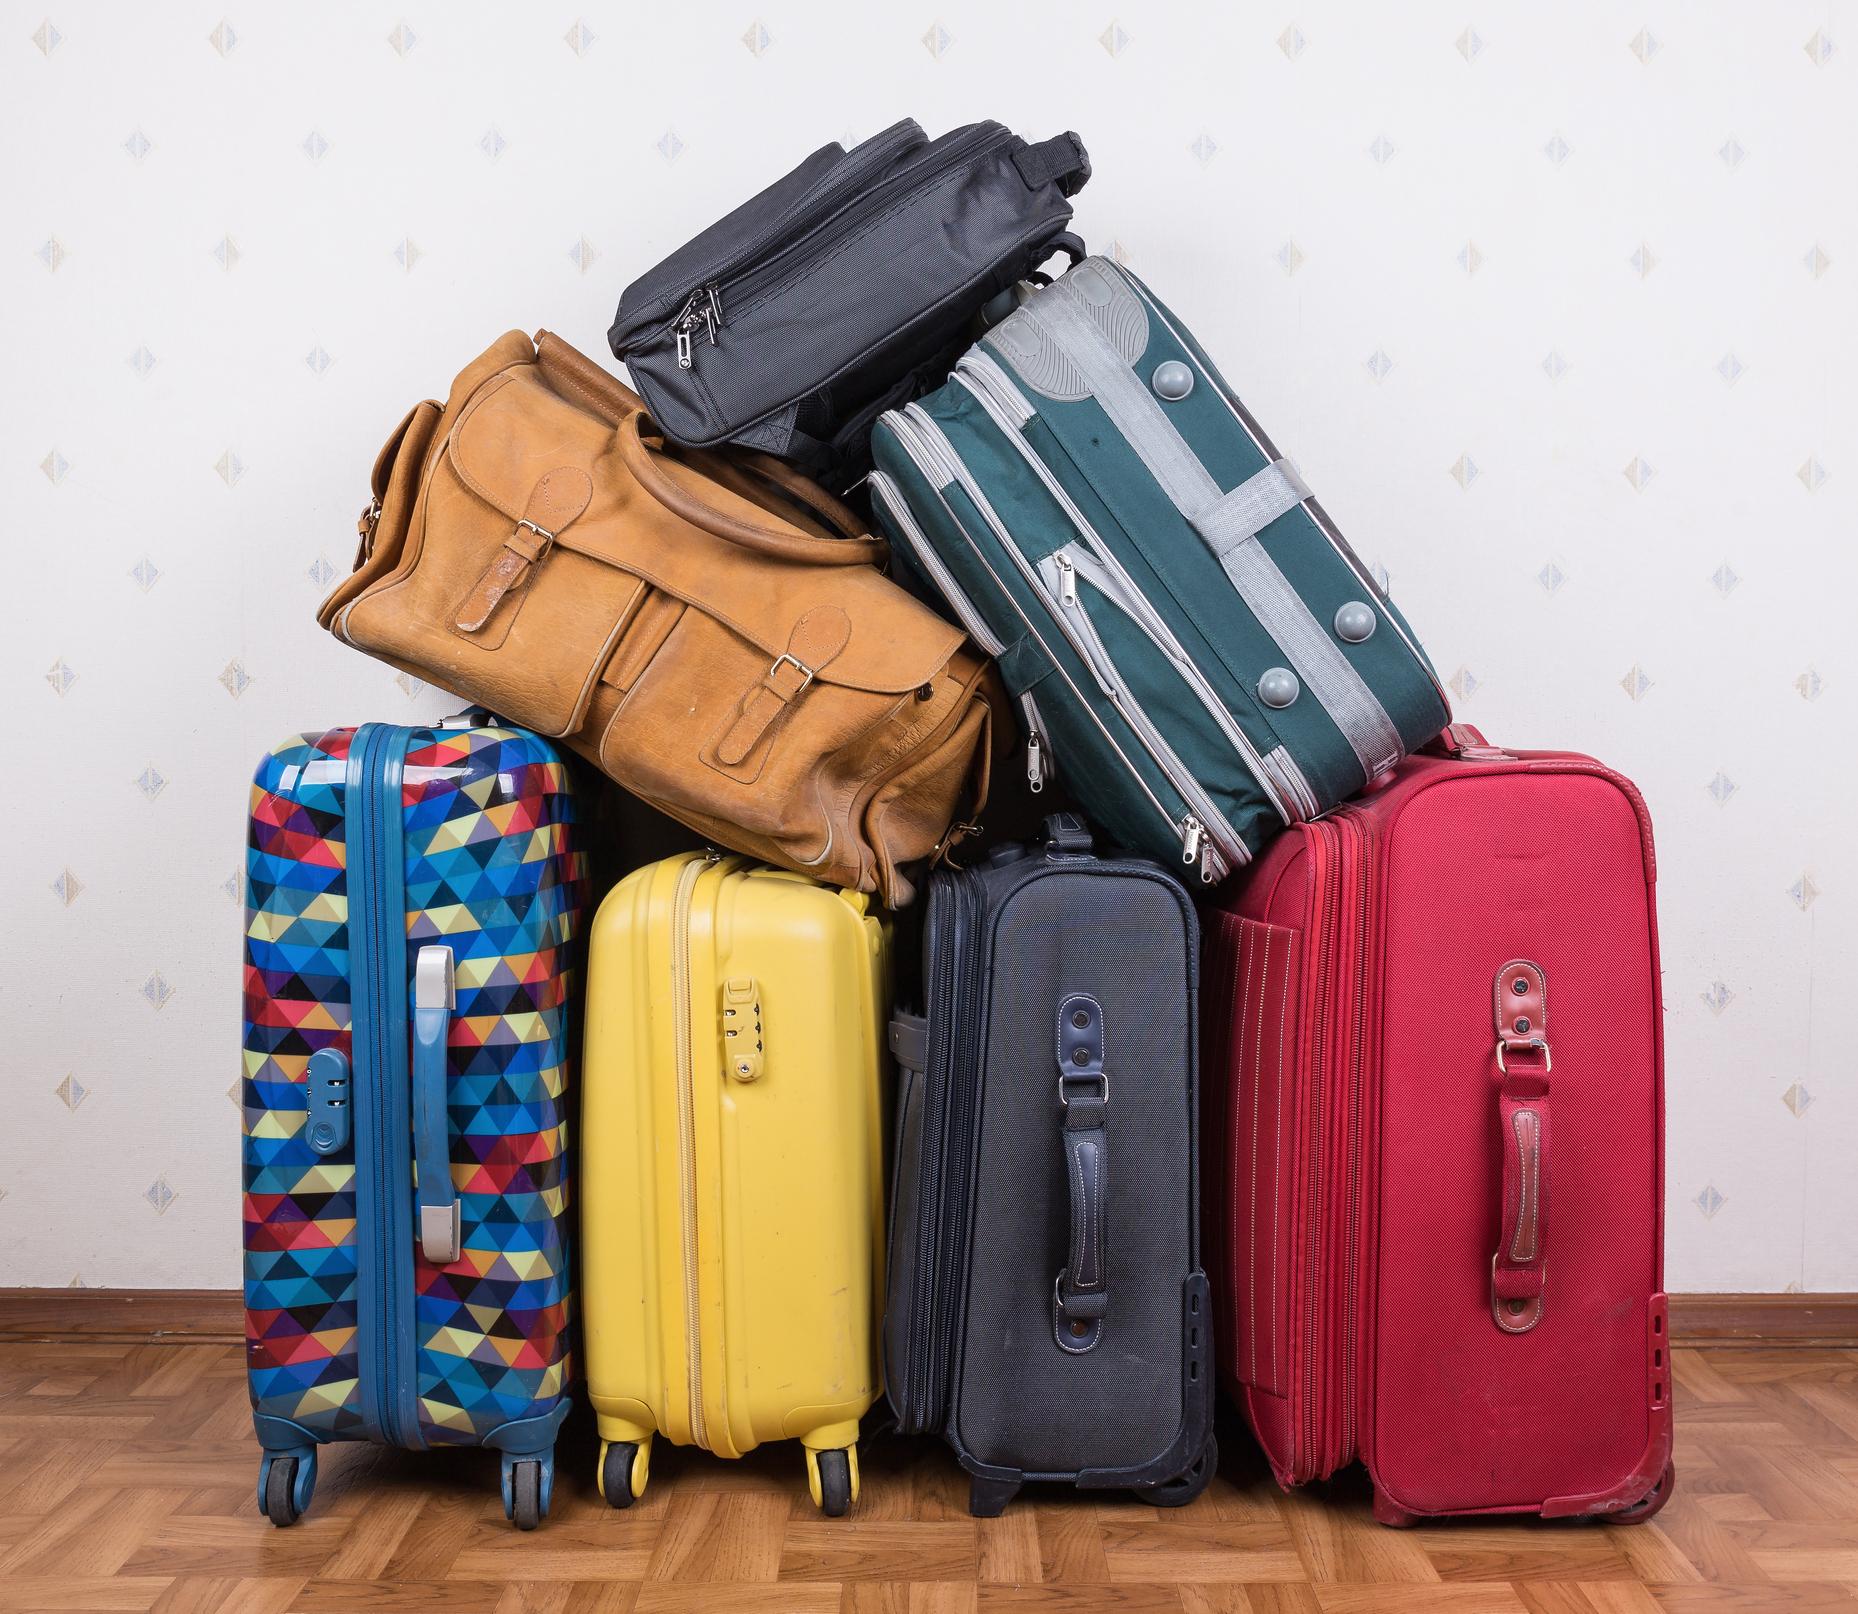 Luggage Storage in Tokyo: Leaving That Baggage Behind | Tokyo Cheapo